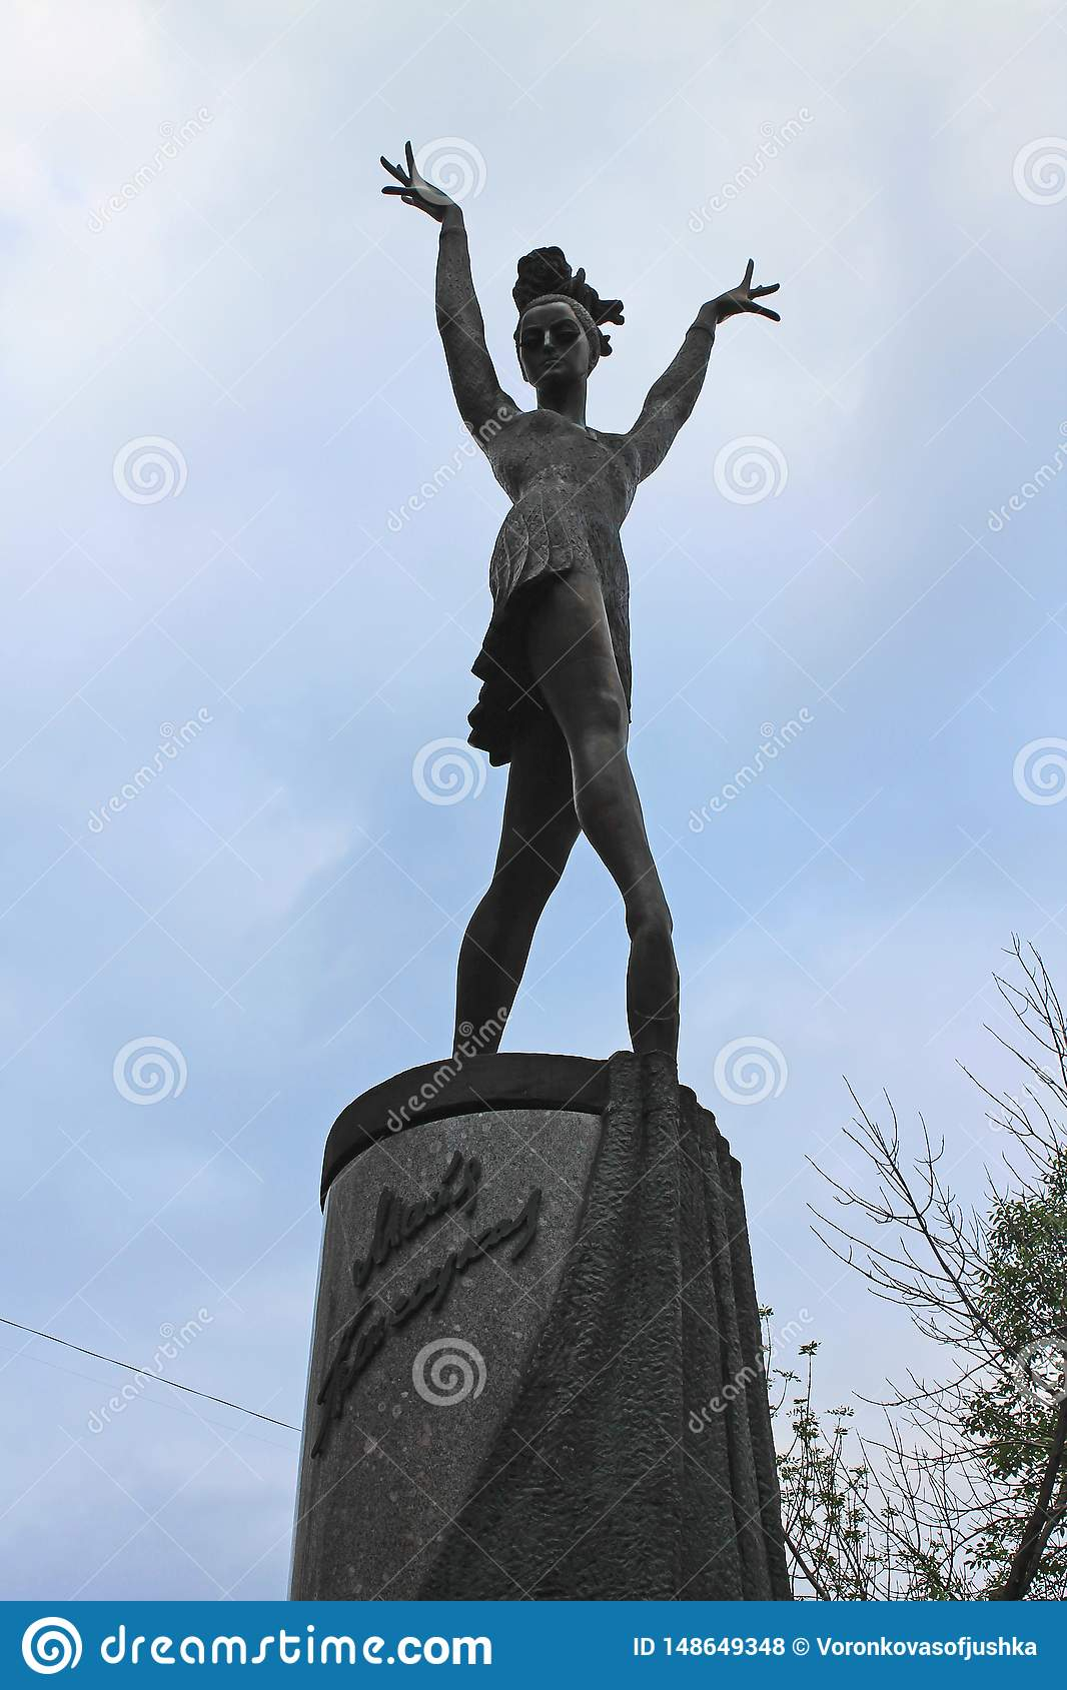 Sculpture of Russian ballerina Maya Plisetskaya in Moscow Russia